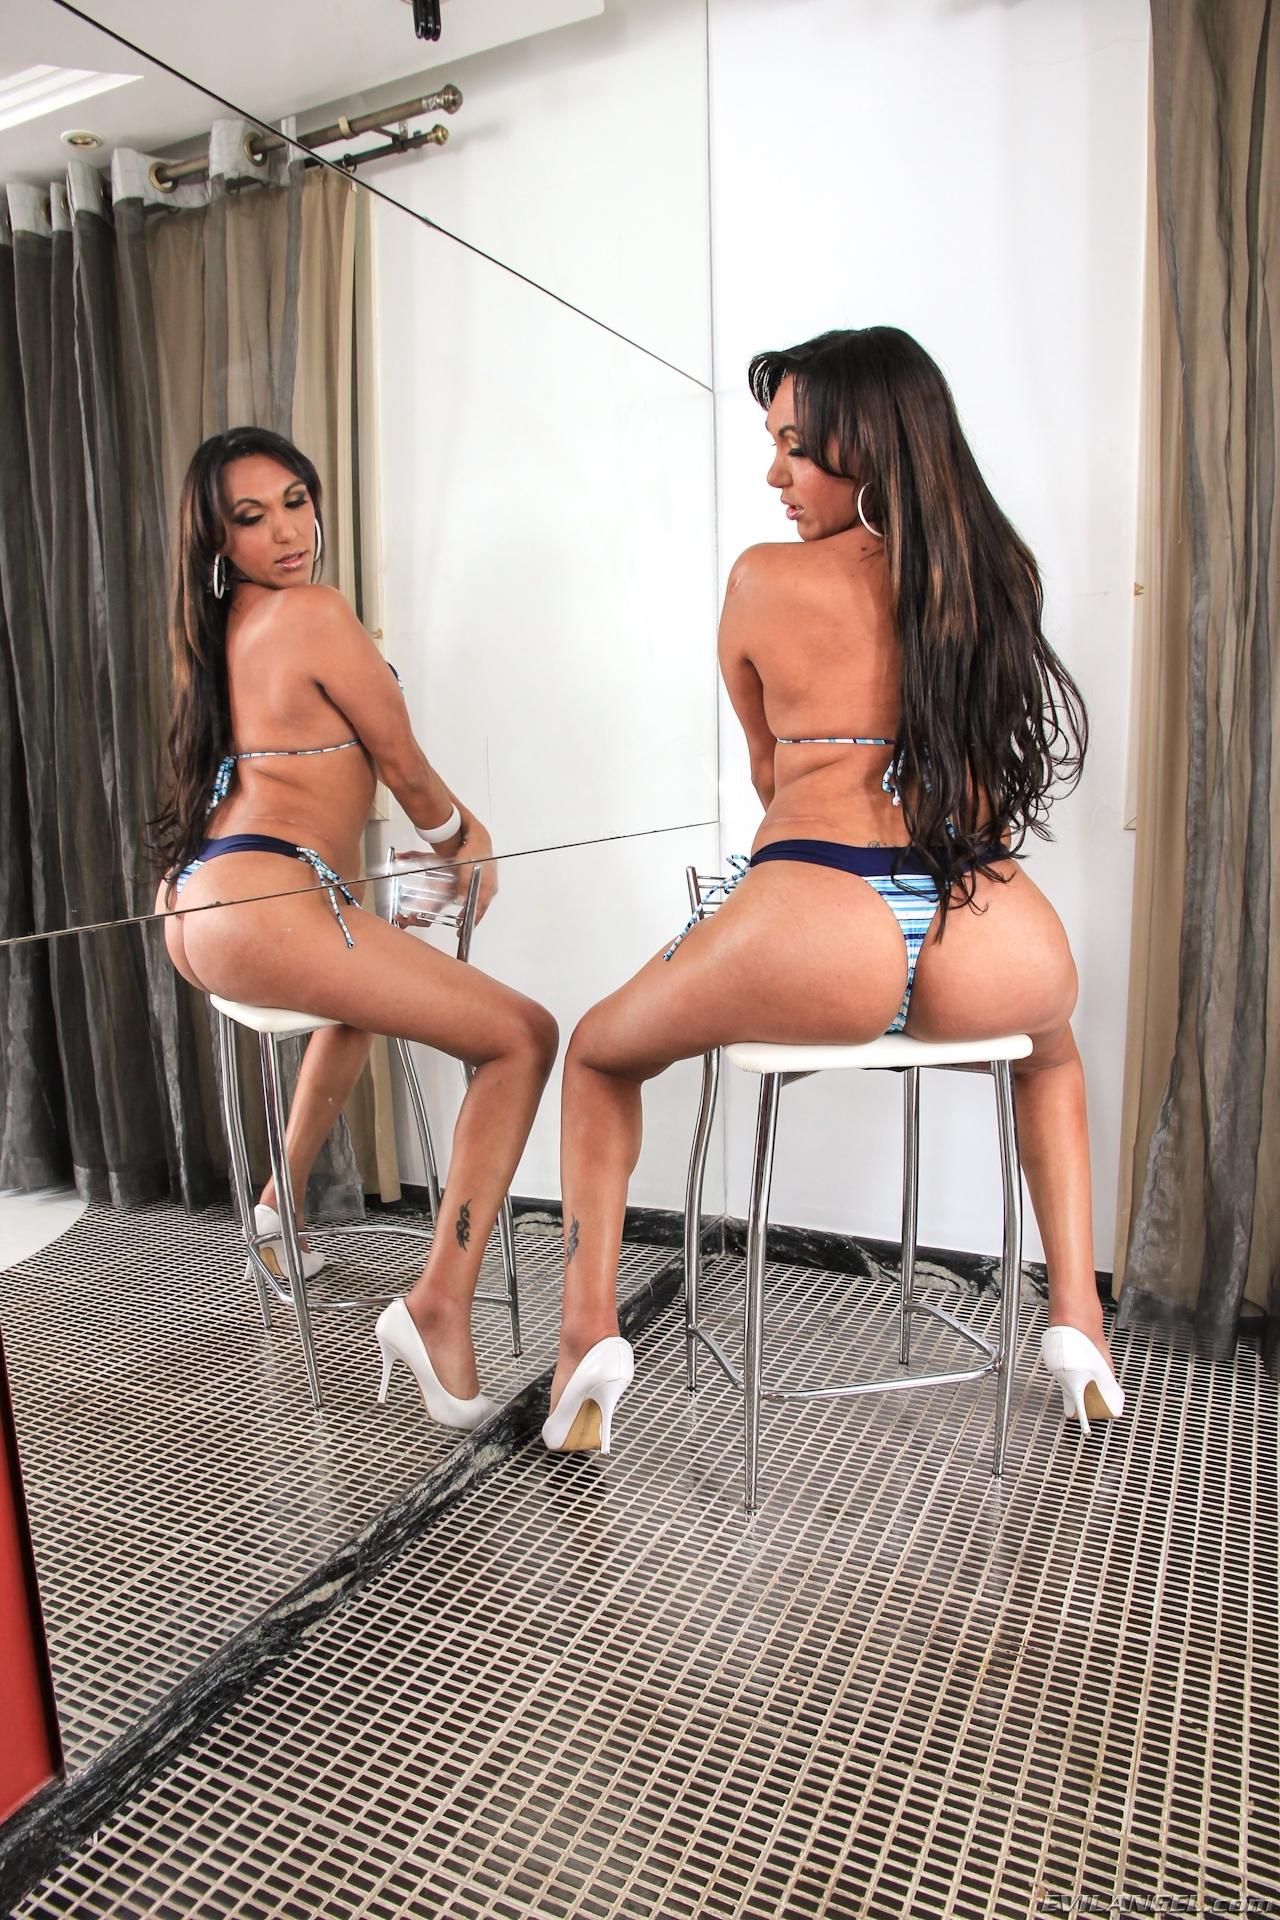 Antonella Fontini Teasing Photos Of Her Tgirl Penis